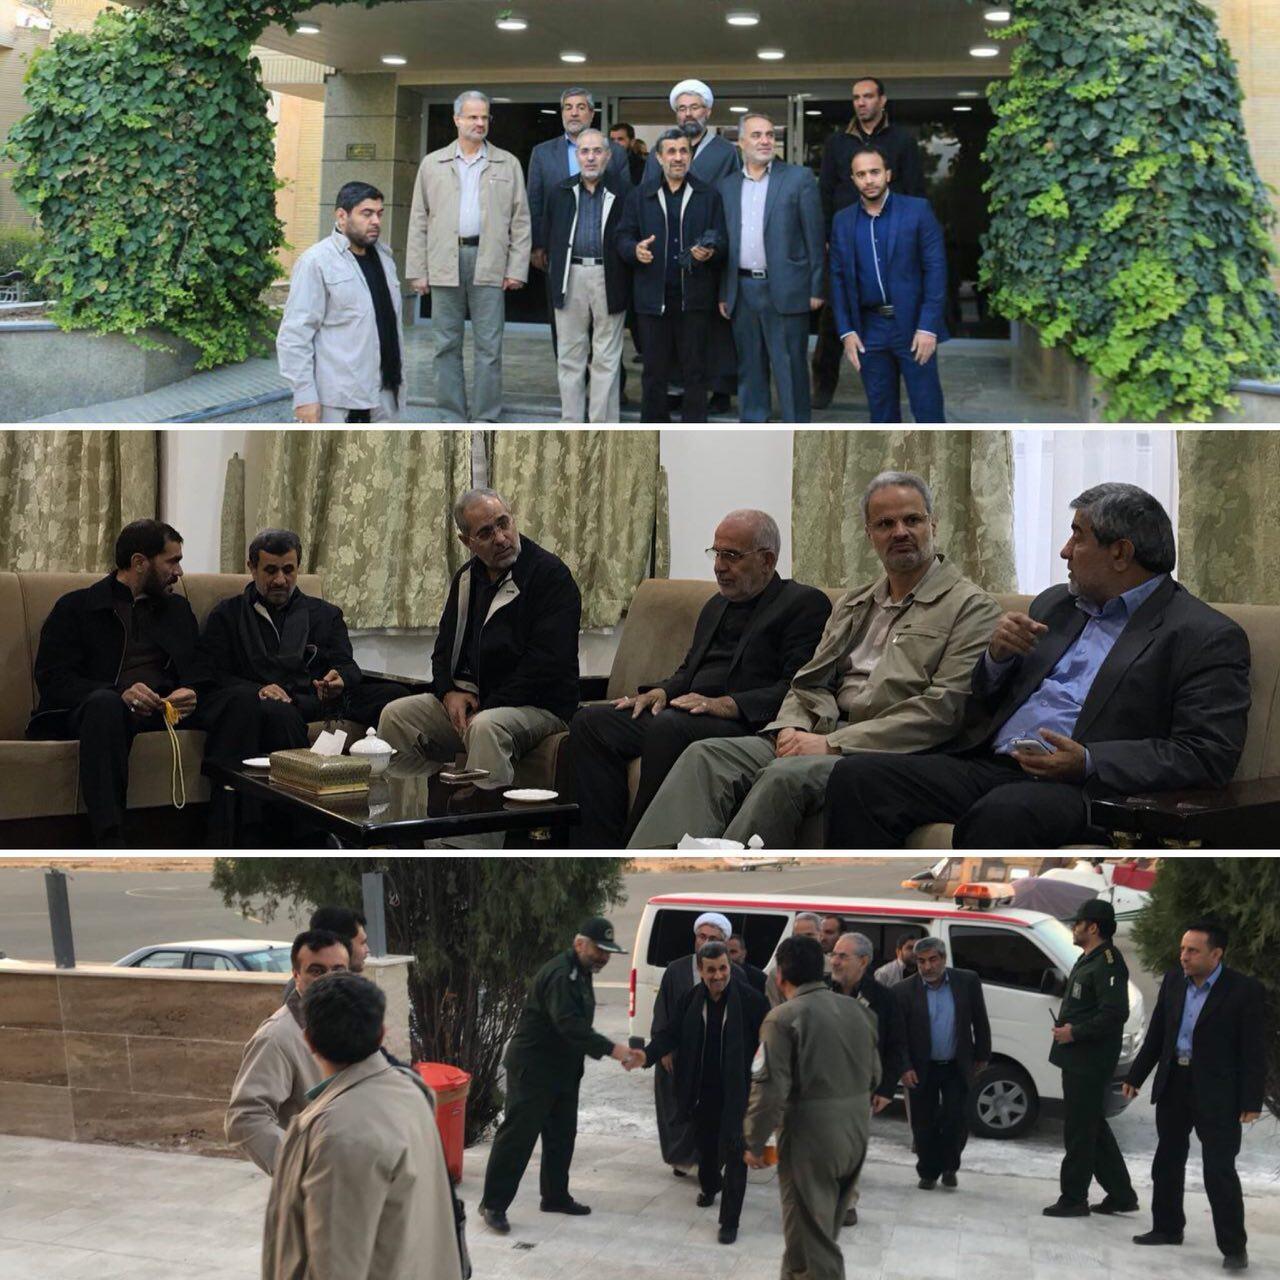 17 11 17 81738photo 2017 11 17 08 14 09 - عکس| احمدینژاد برای بازدید از مناطق زلزلهزده به کرمانشاه رفت